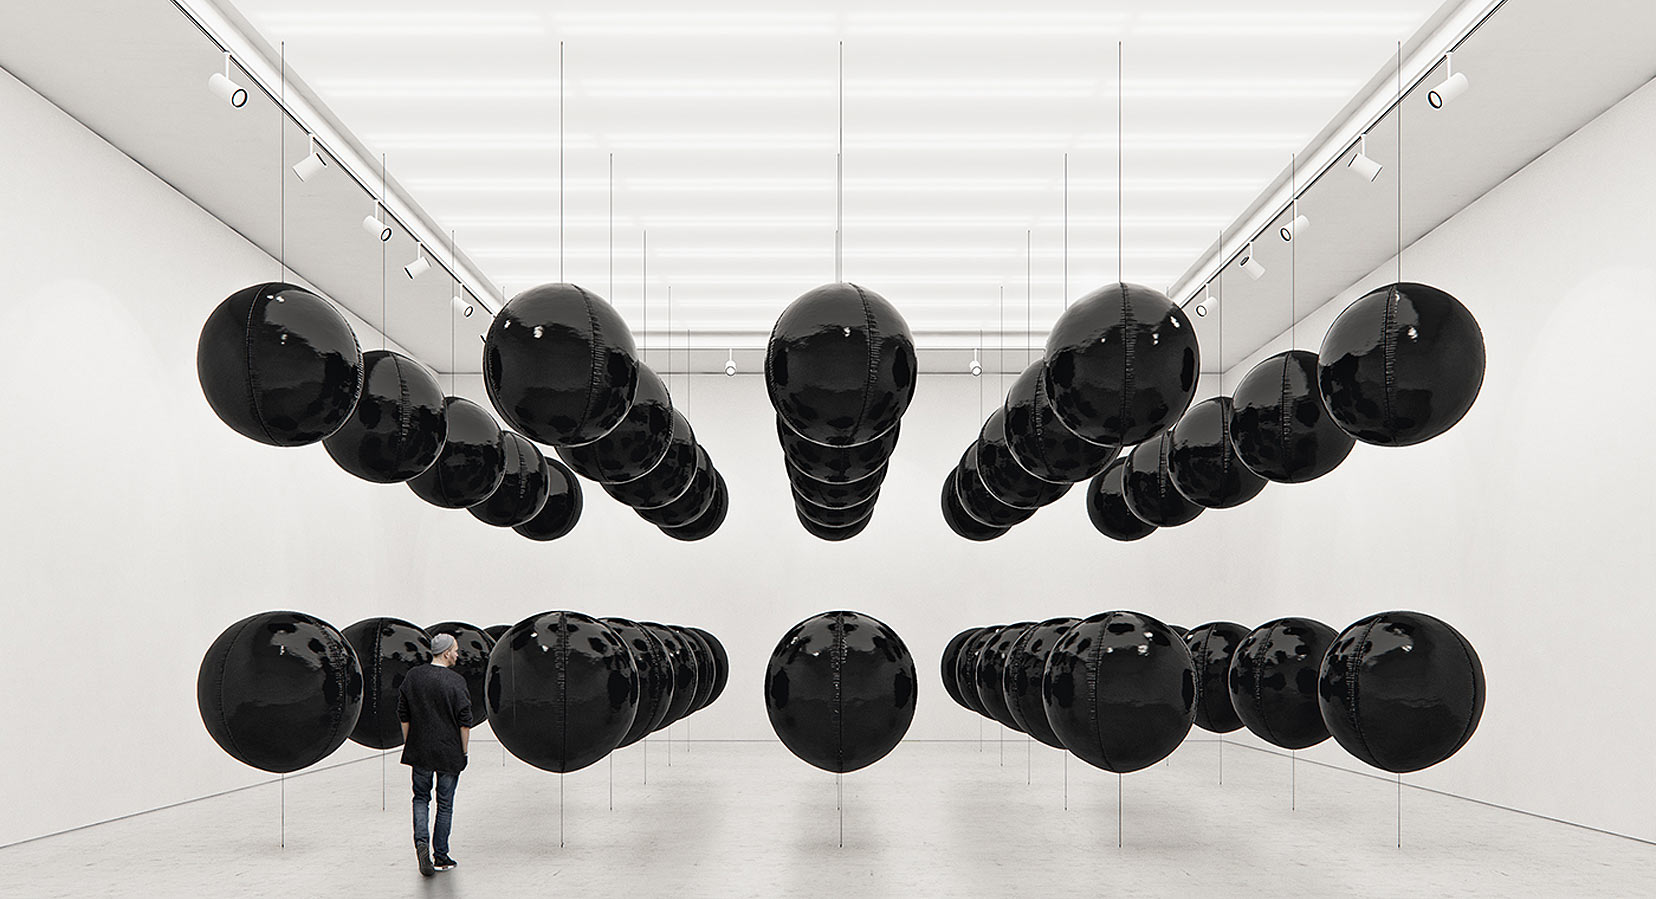 Black Balloons by Tadao Cern